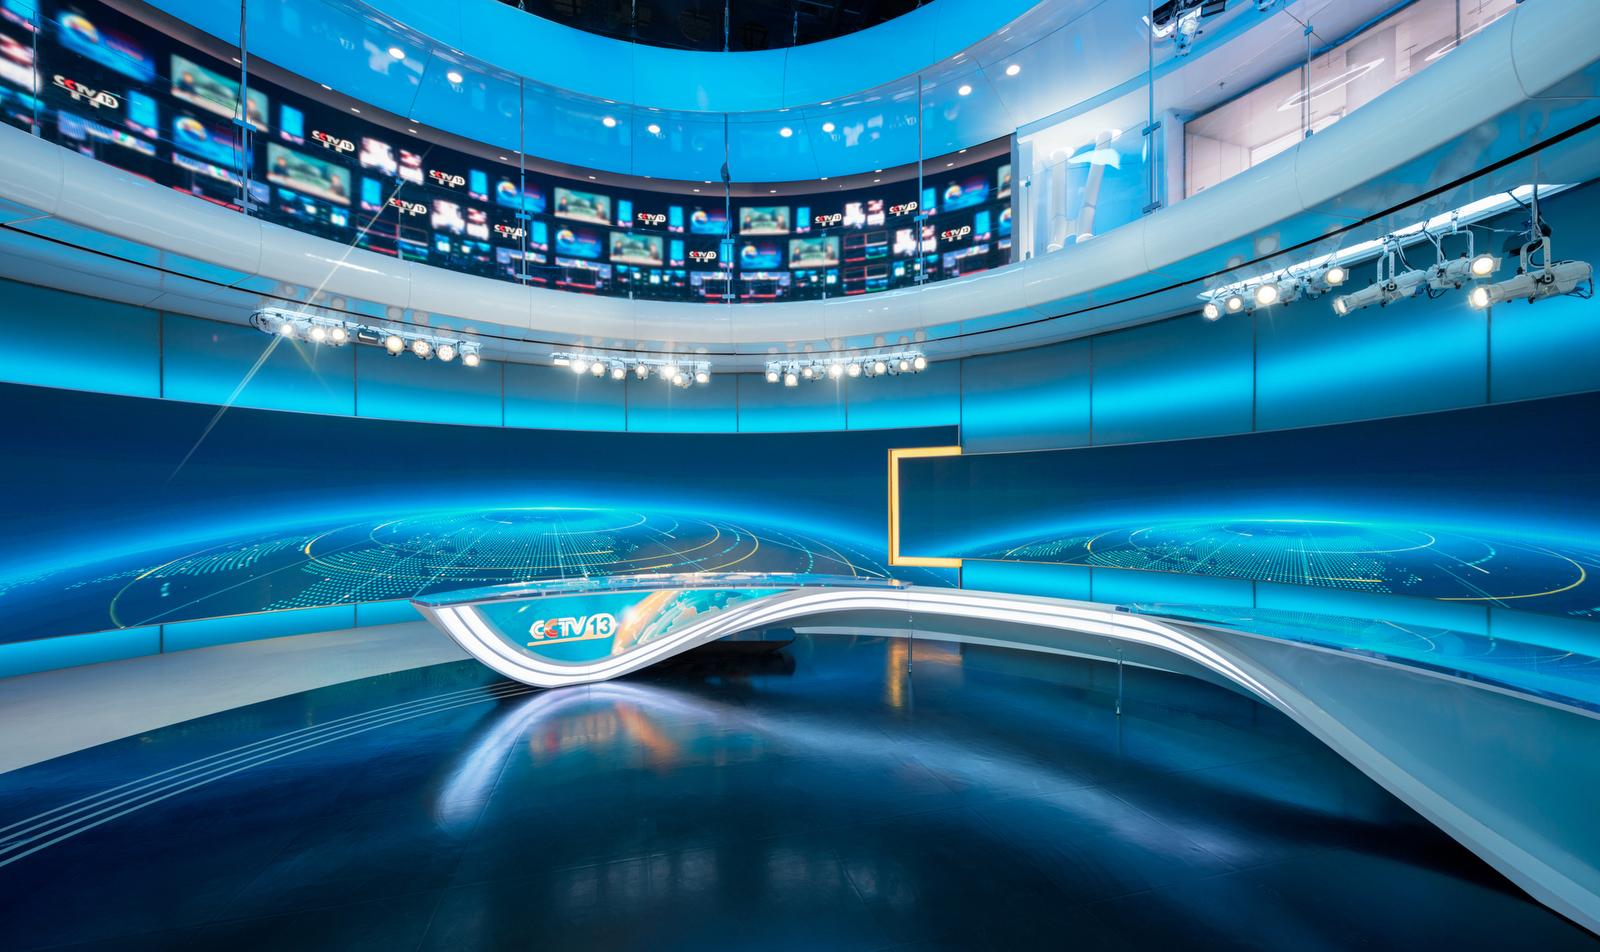 NCS_CCTV13-Set-Design_Clickspring_0001